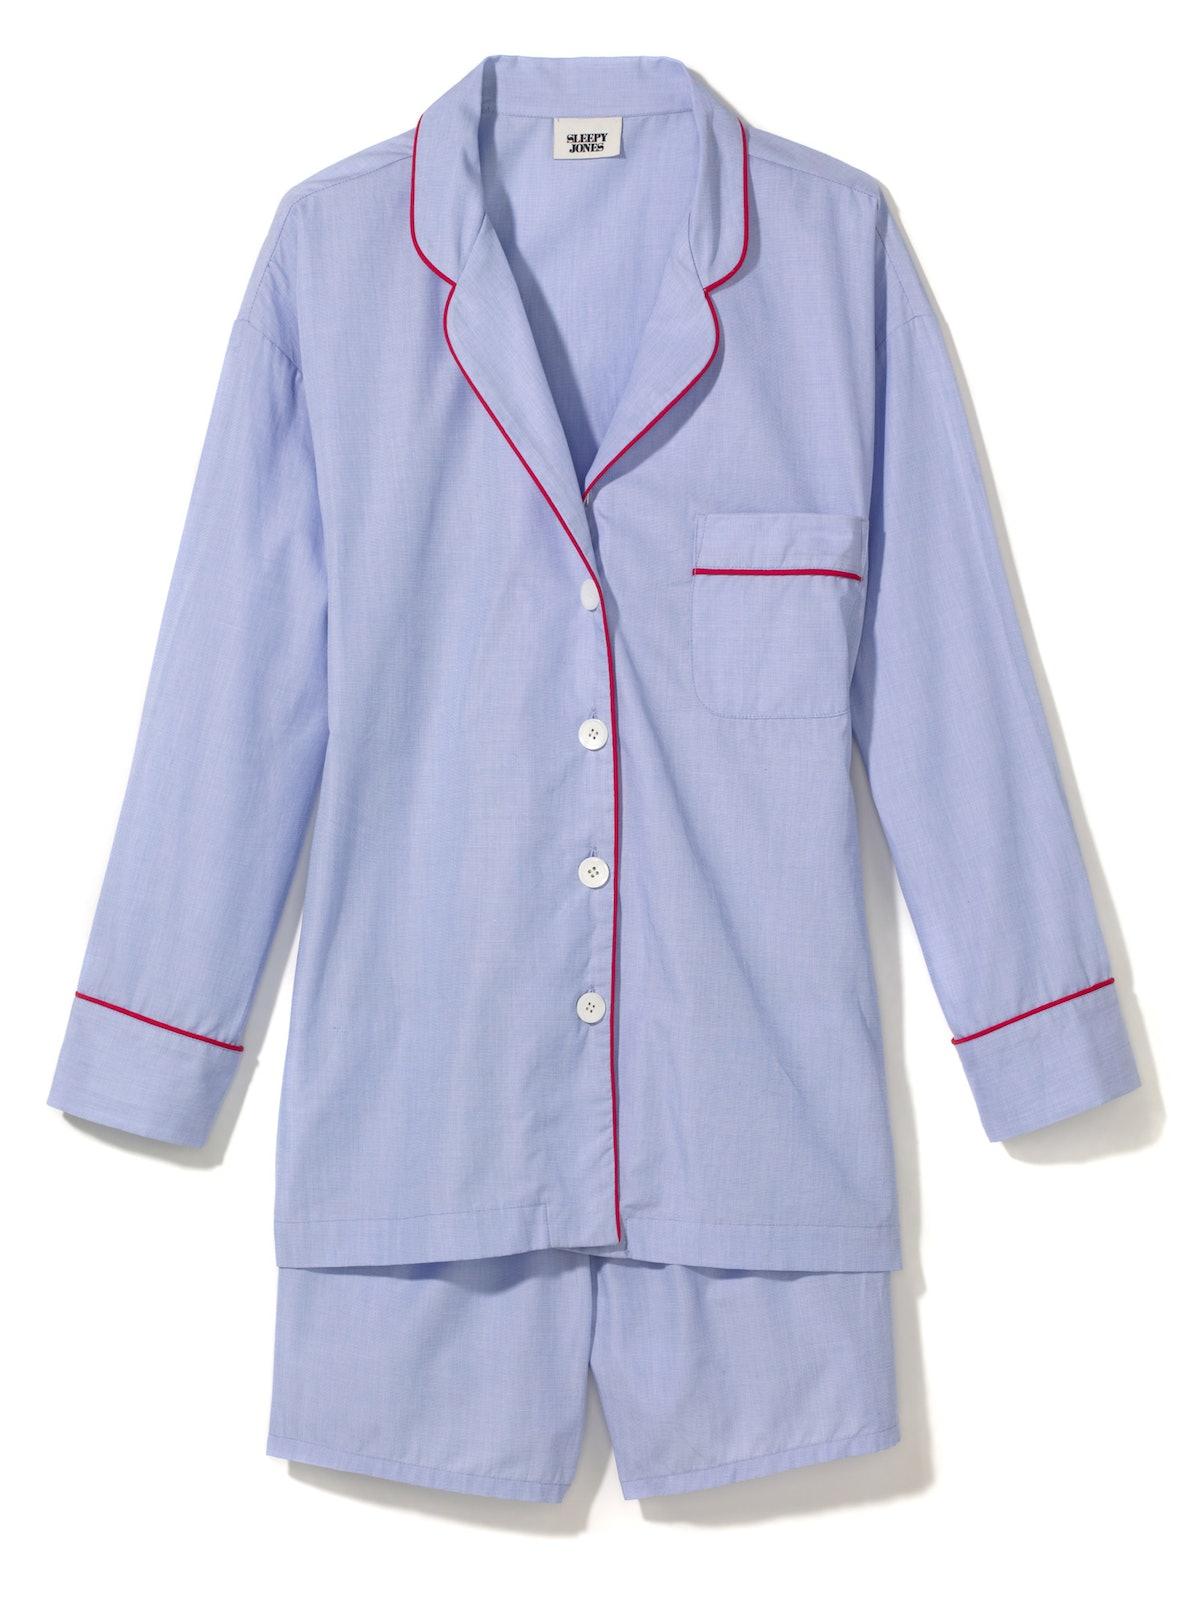 Sleepy Jones pajama shirt